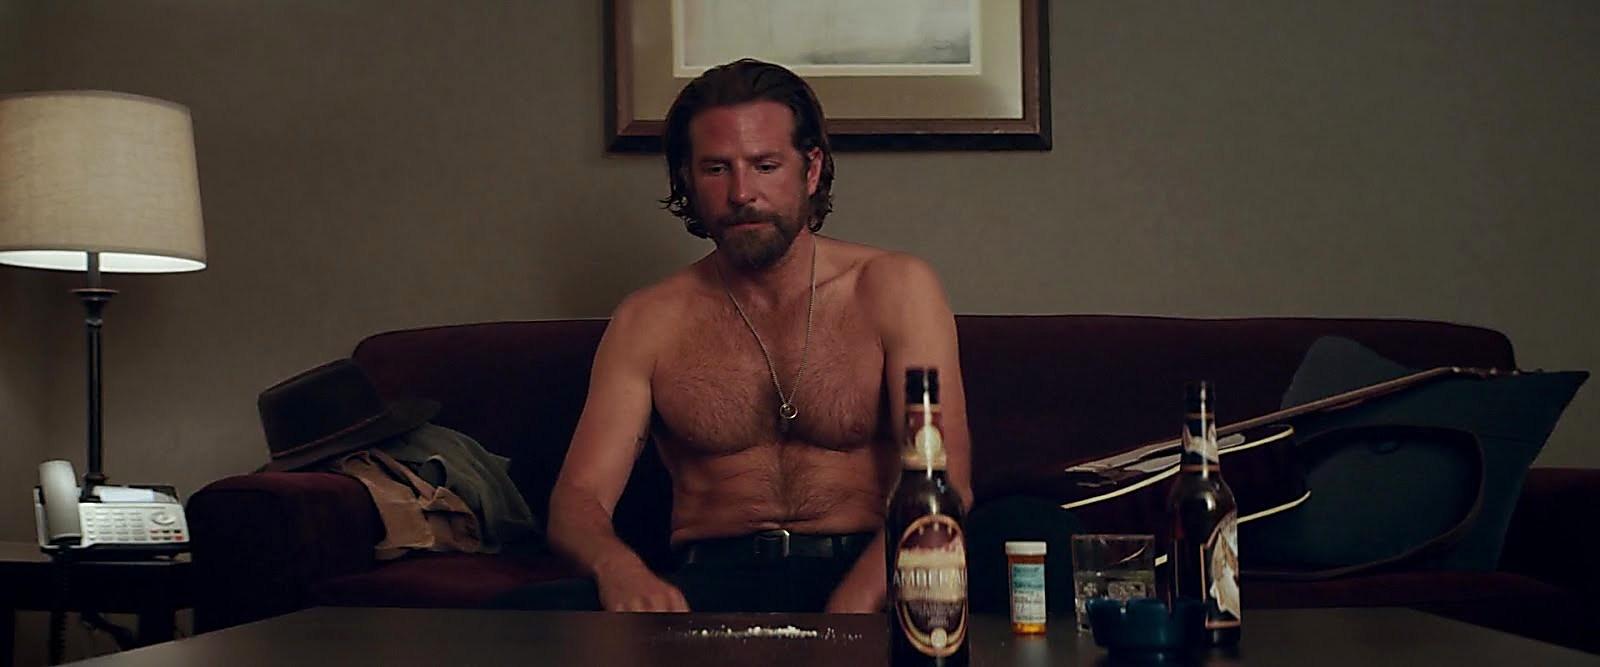 Bradley Cooper sexy shirtless scene January 20, 2019, 8am